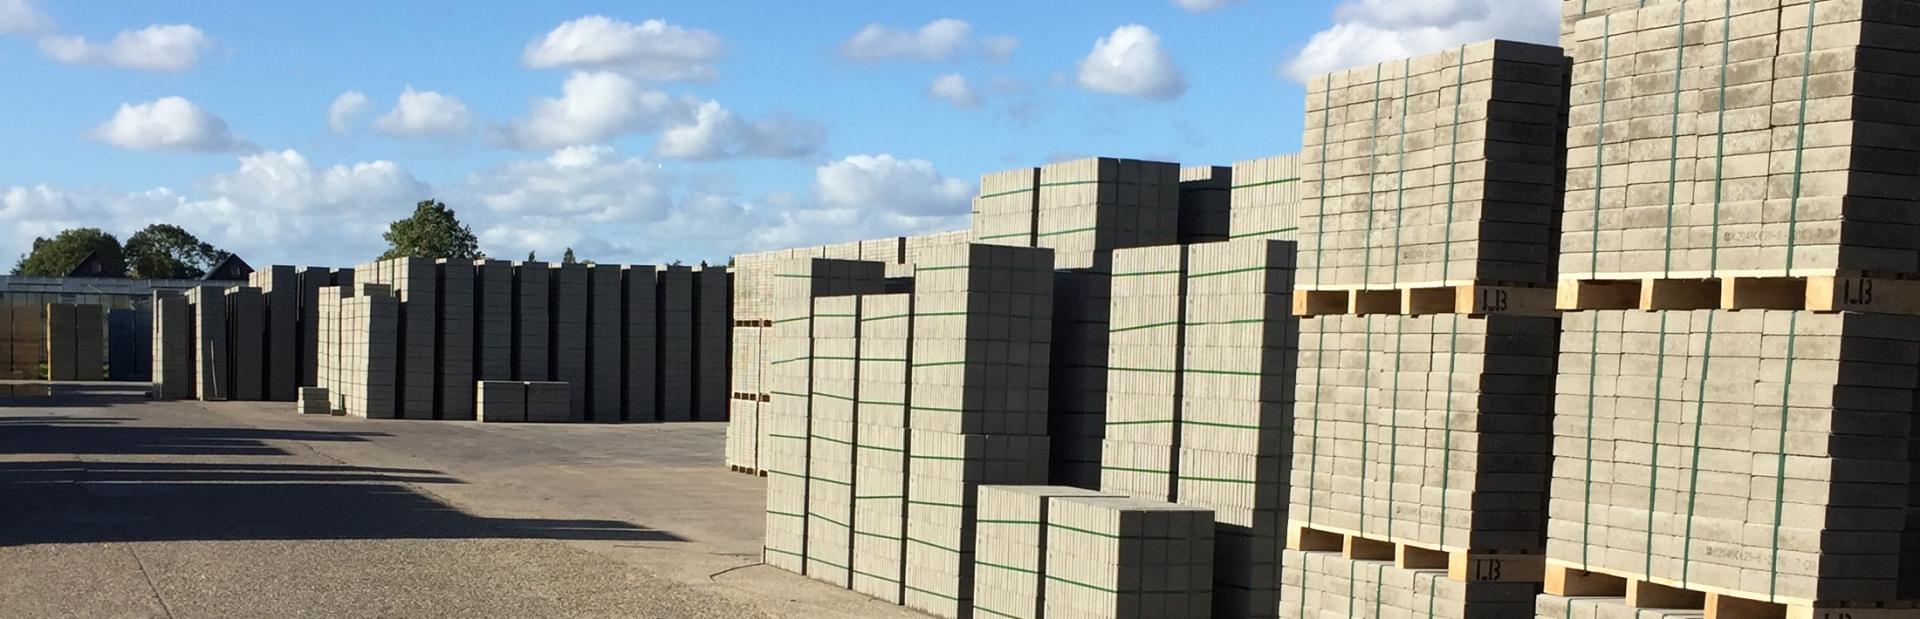 Betontegels 60x60 Brabant.B V Betonfabriek V H Gebr Langhout Gespecialiseerd In Betontegels